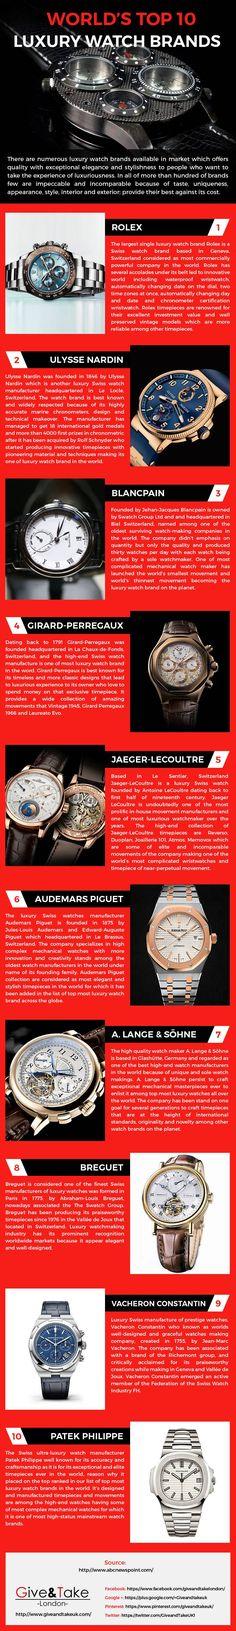 World's Top 10 Luxury Watch Brands #Infographic #Watches